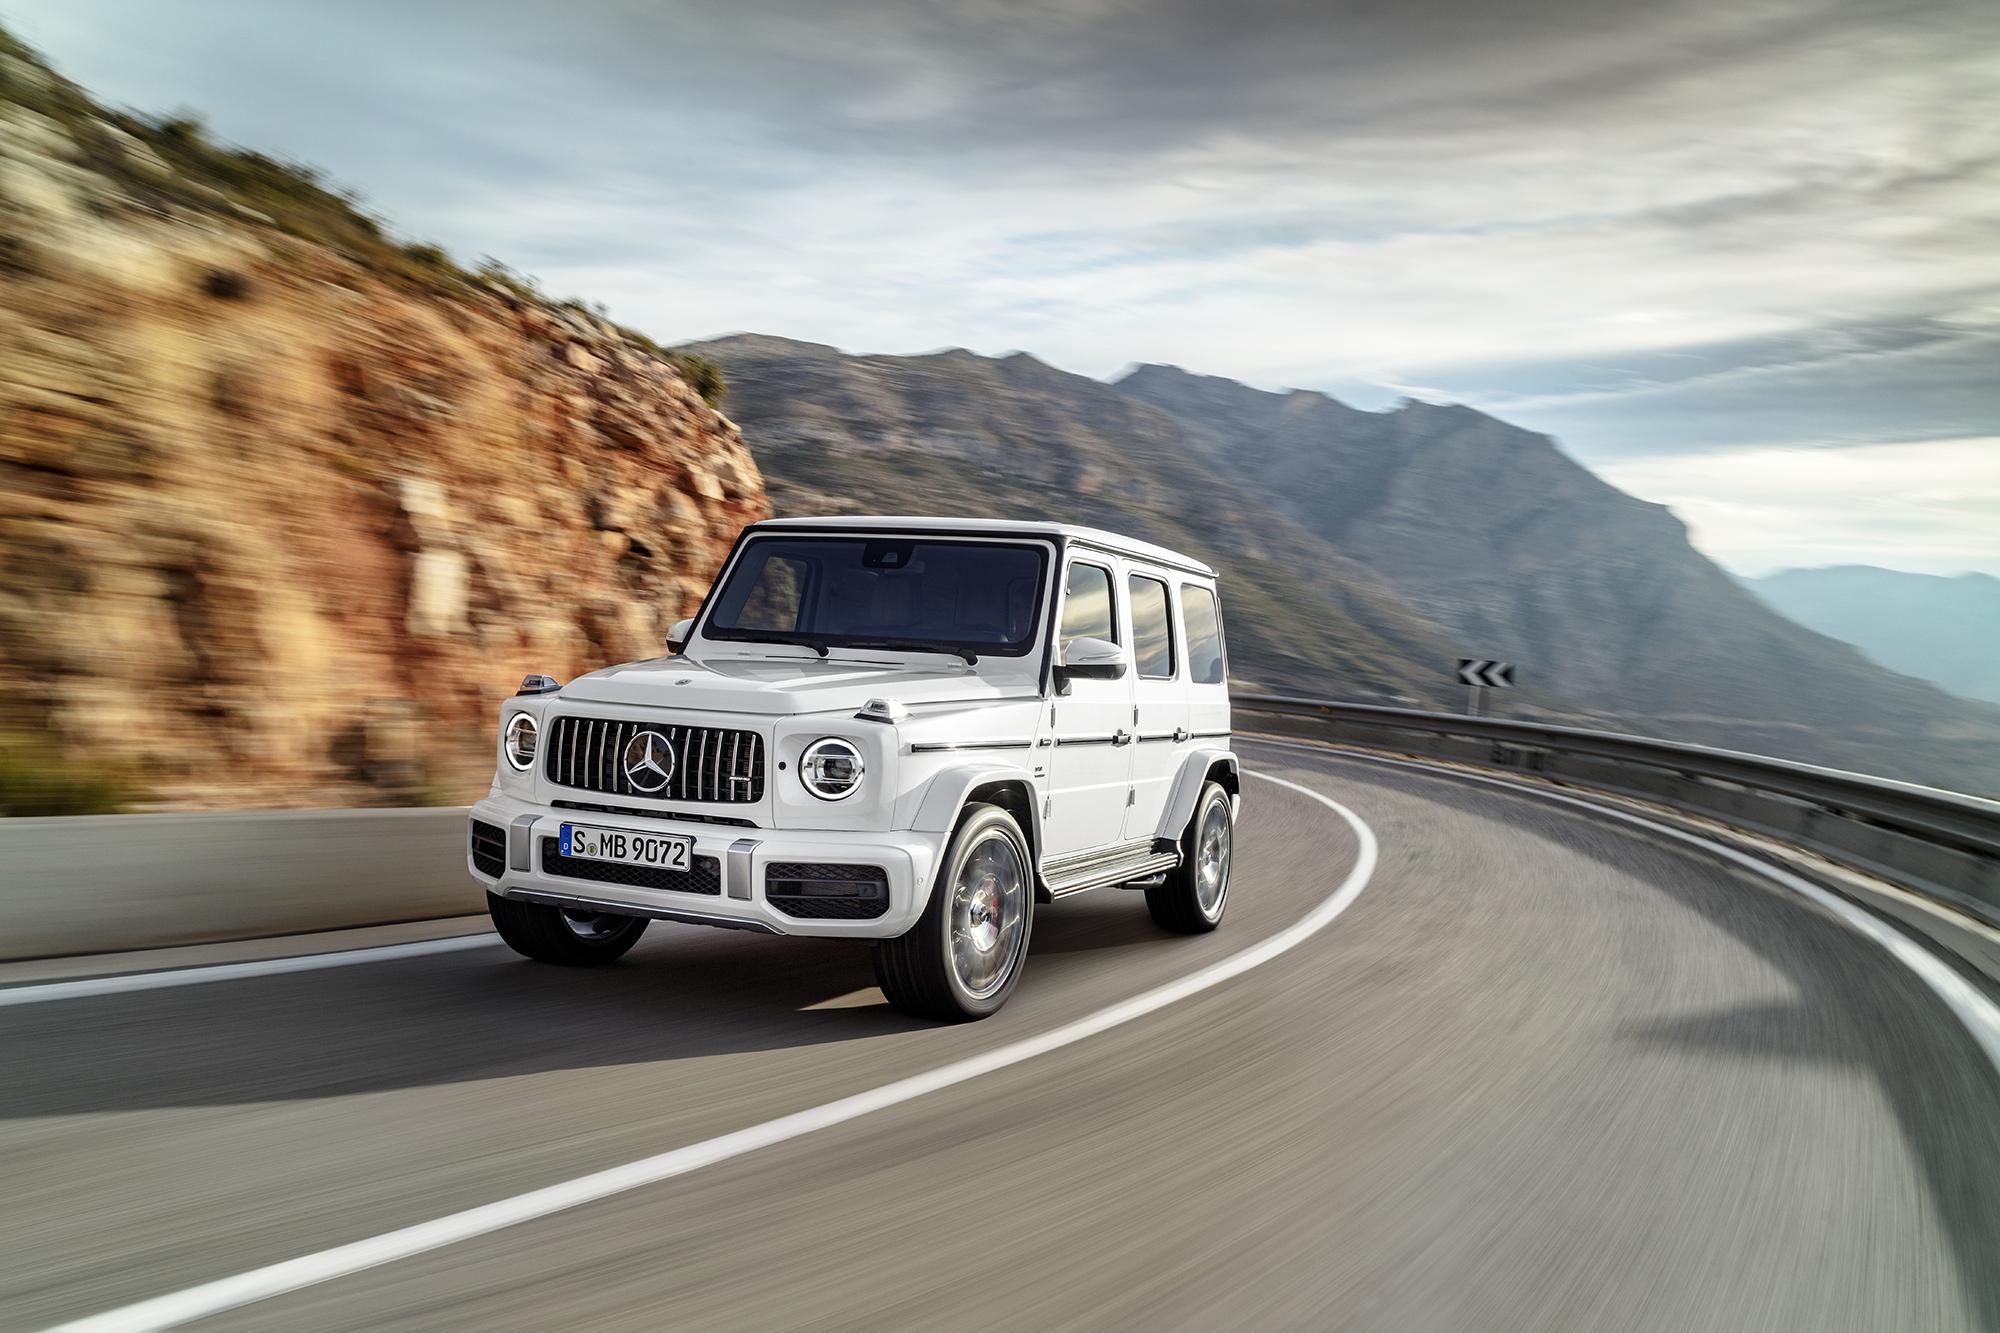 Mercedes AMG G 63 branco em rodovia